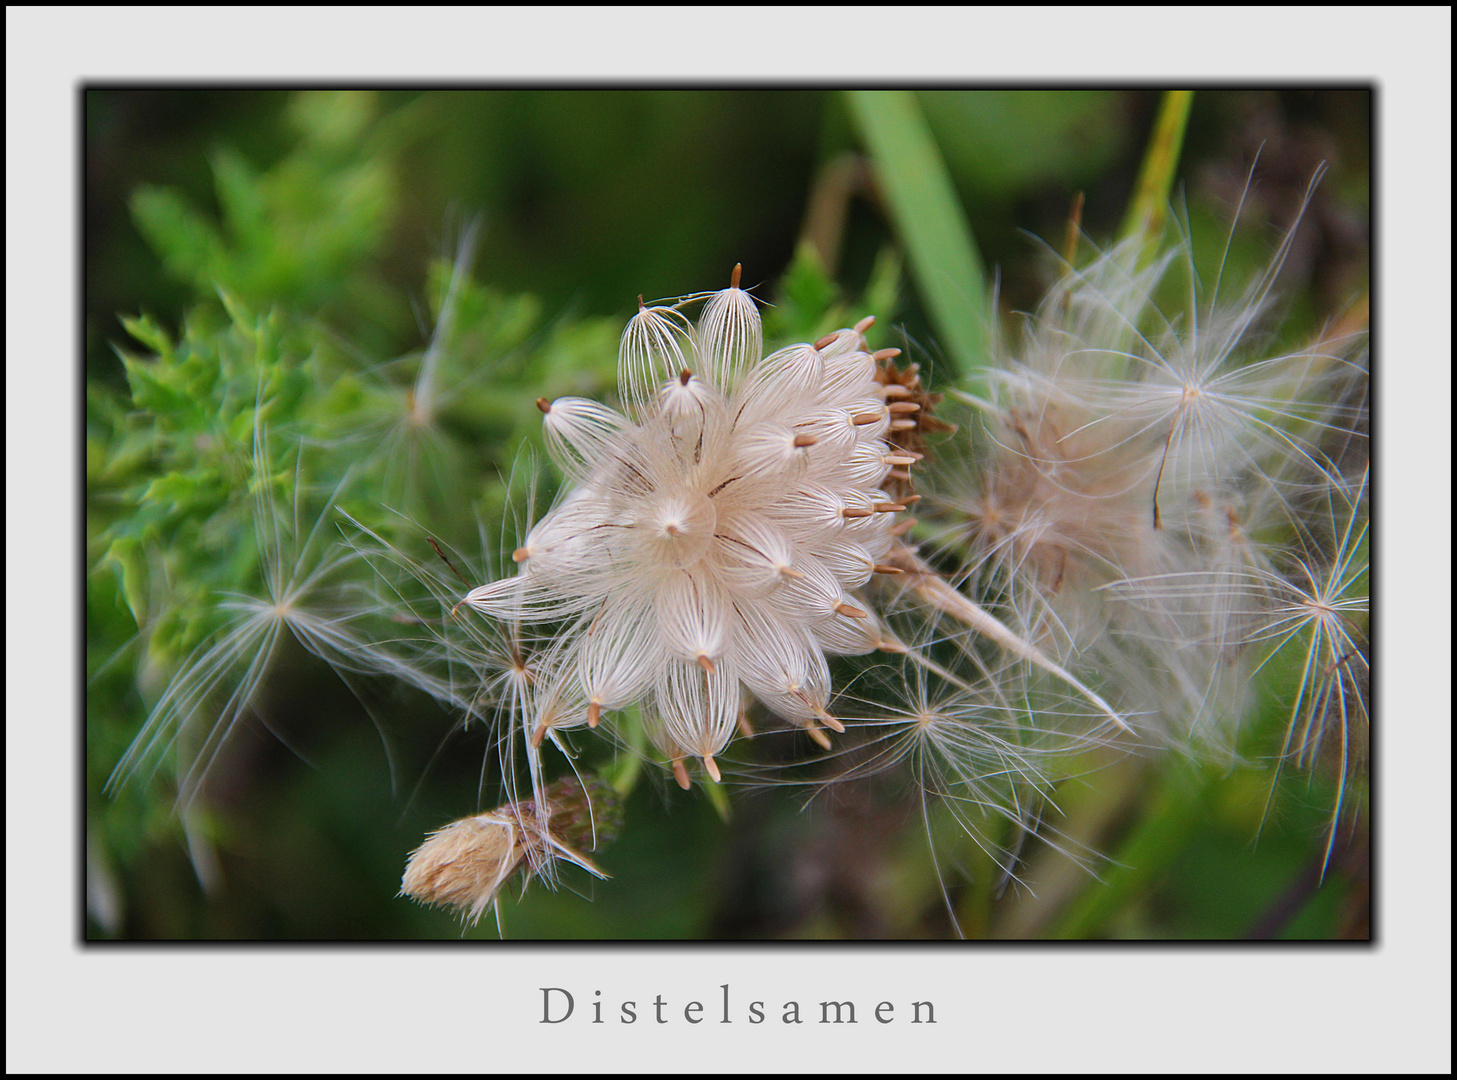 Distelsamen - Explosion